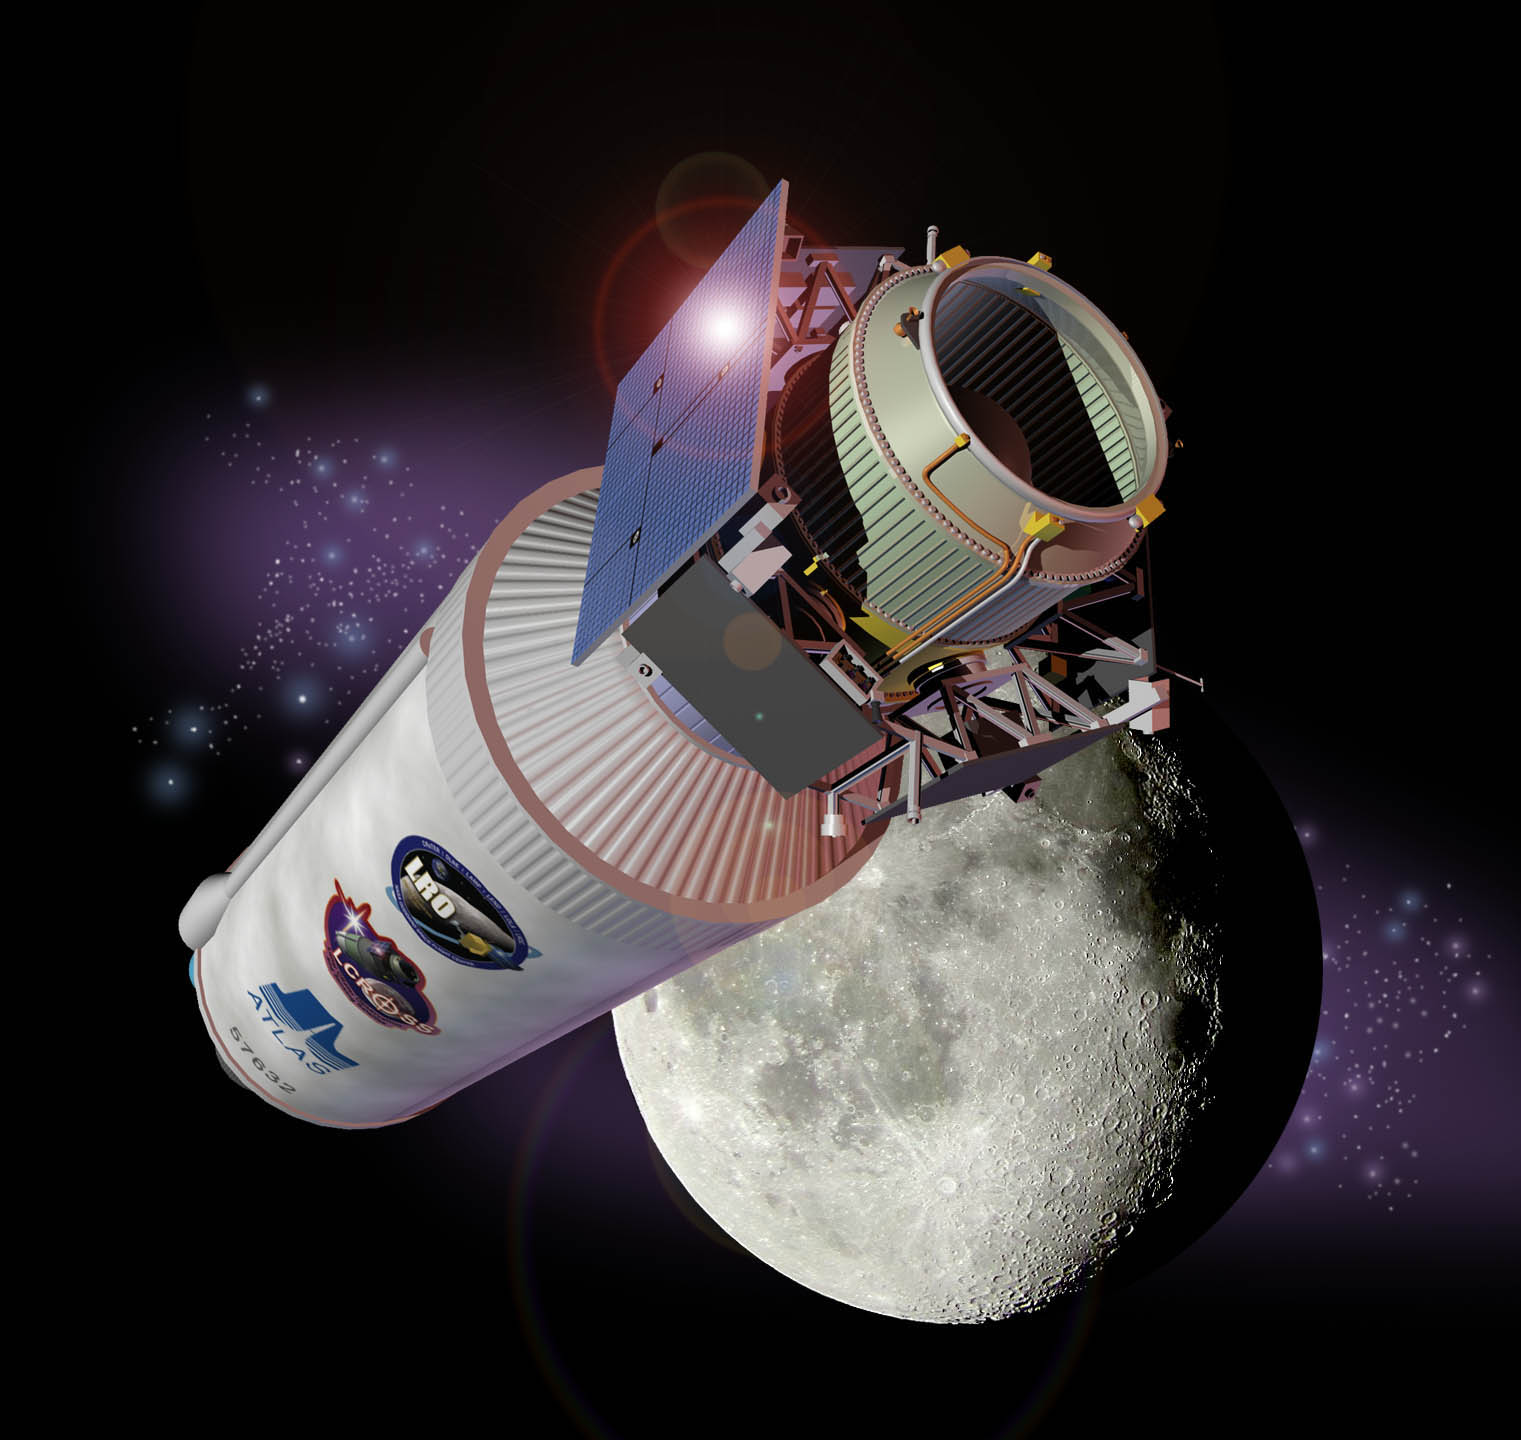 moon observation nasa - photo #20